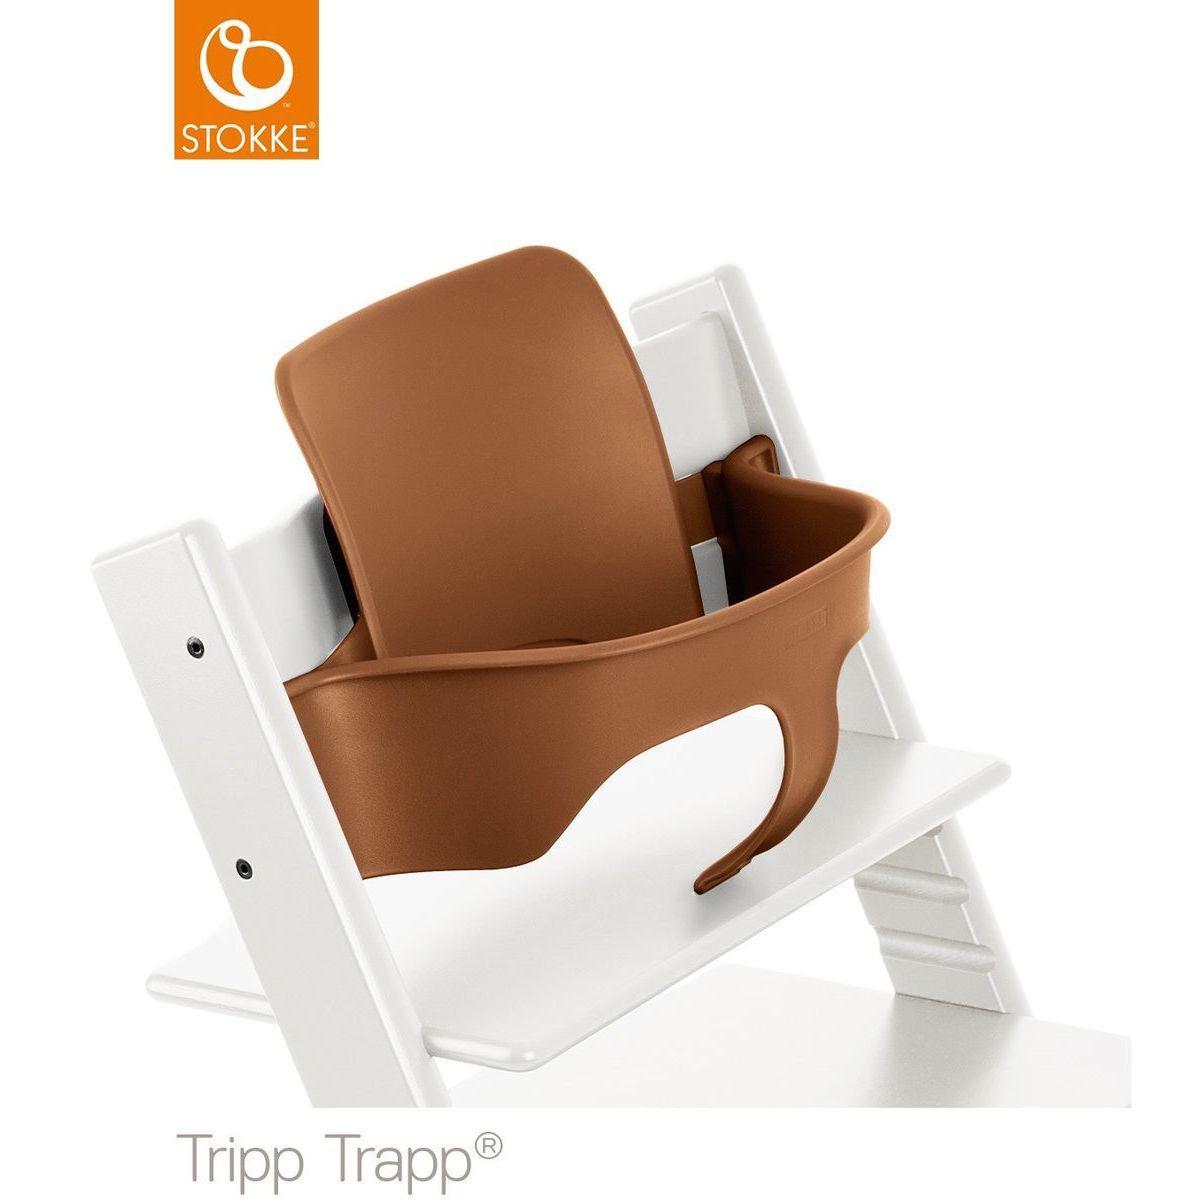 Baby set chaise haute TRIPP TRAPP Stokke noyer